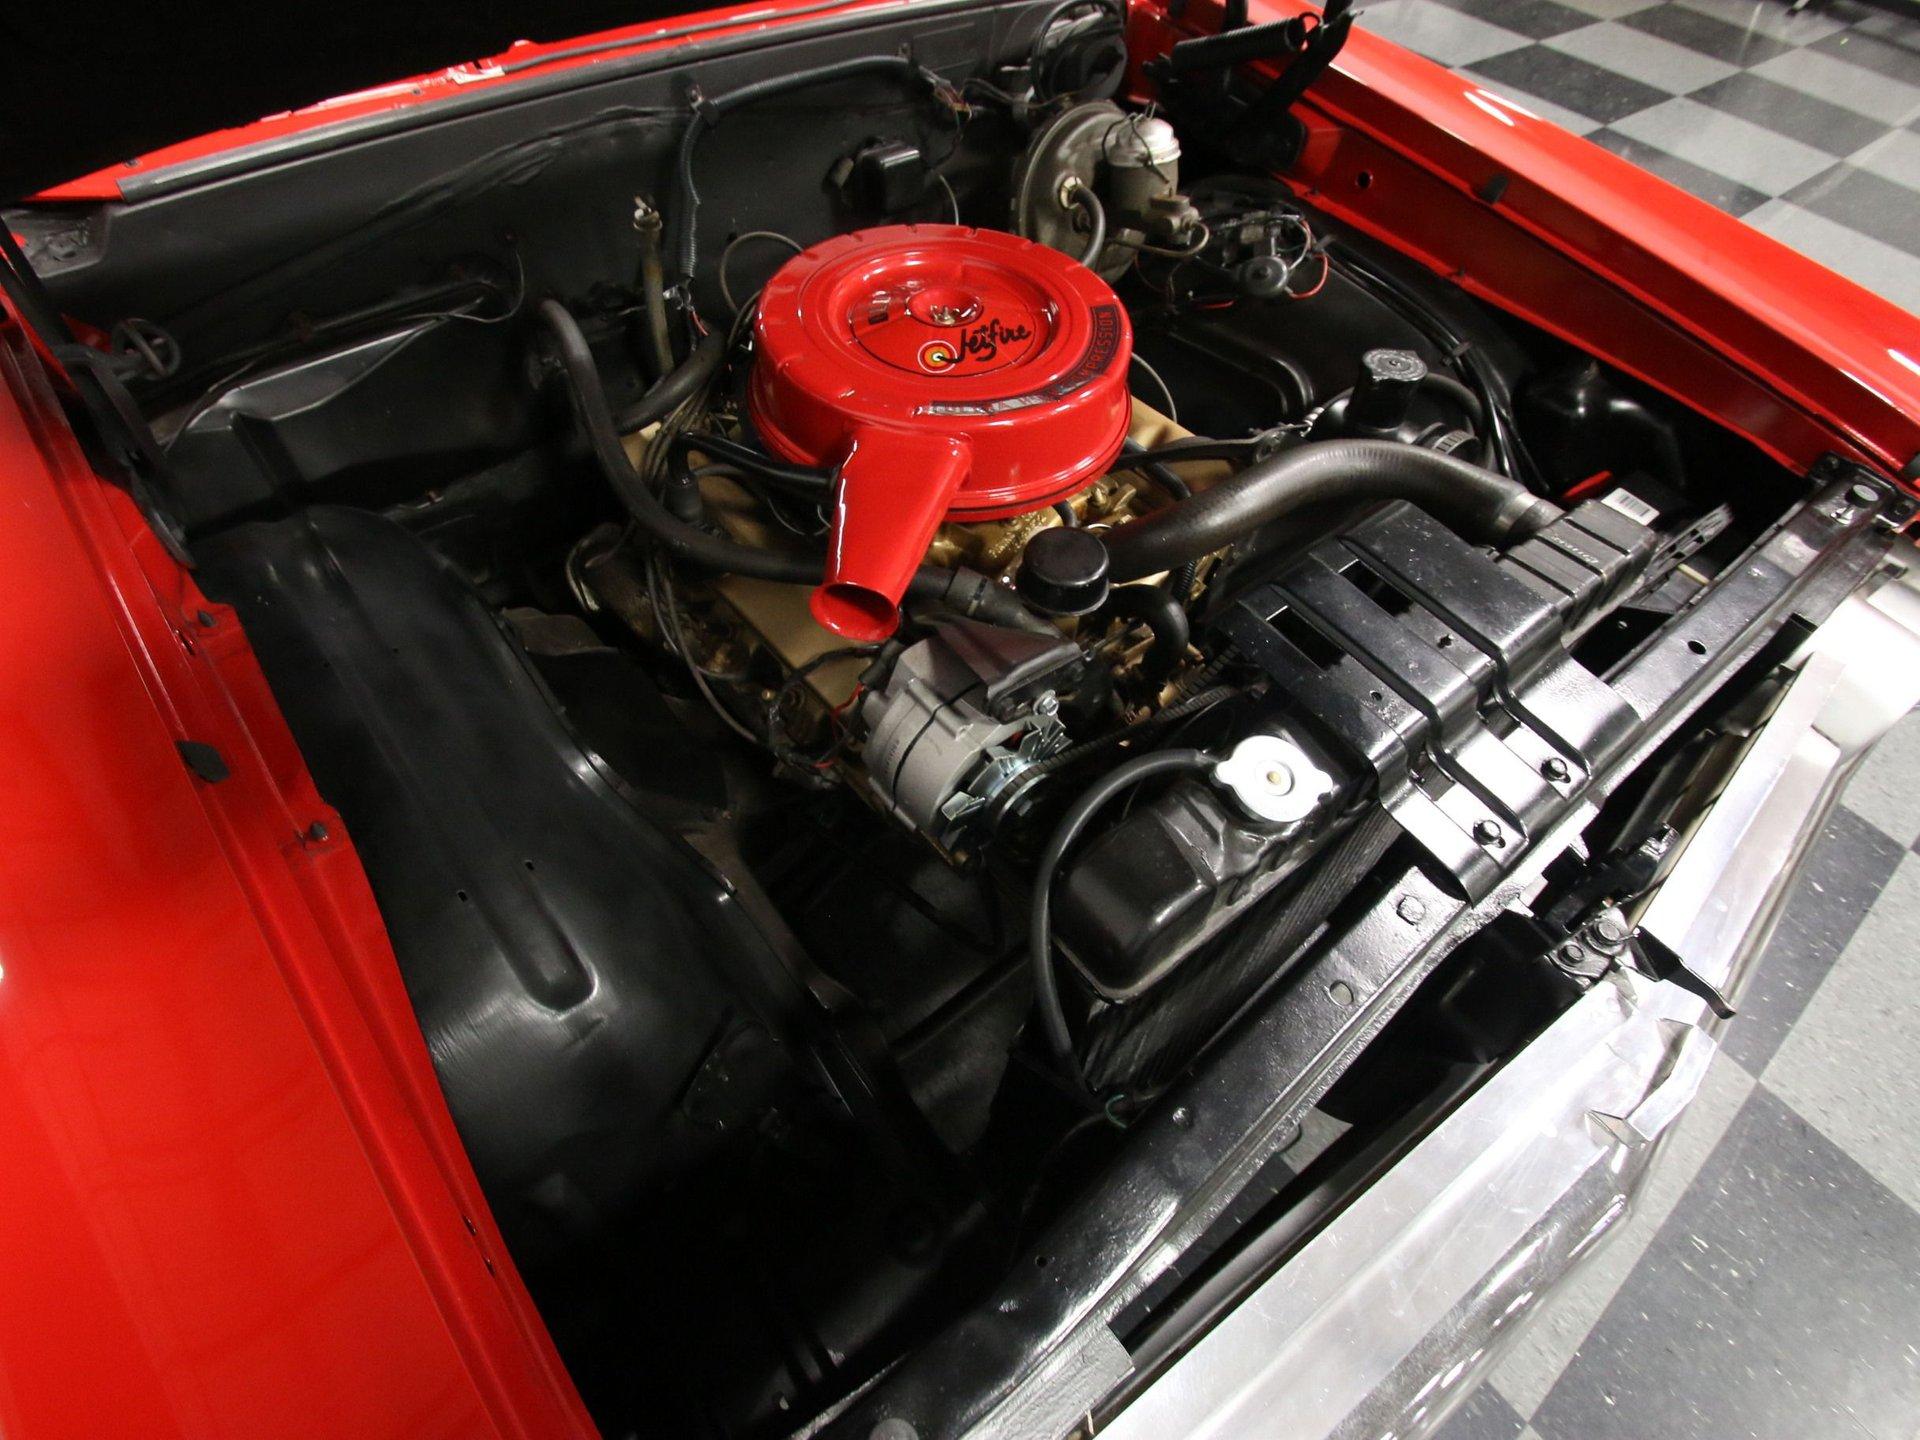 1964 Oldsmobile Cutlass Streetside Classics The Nations Trusted